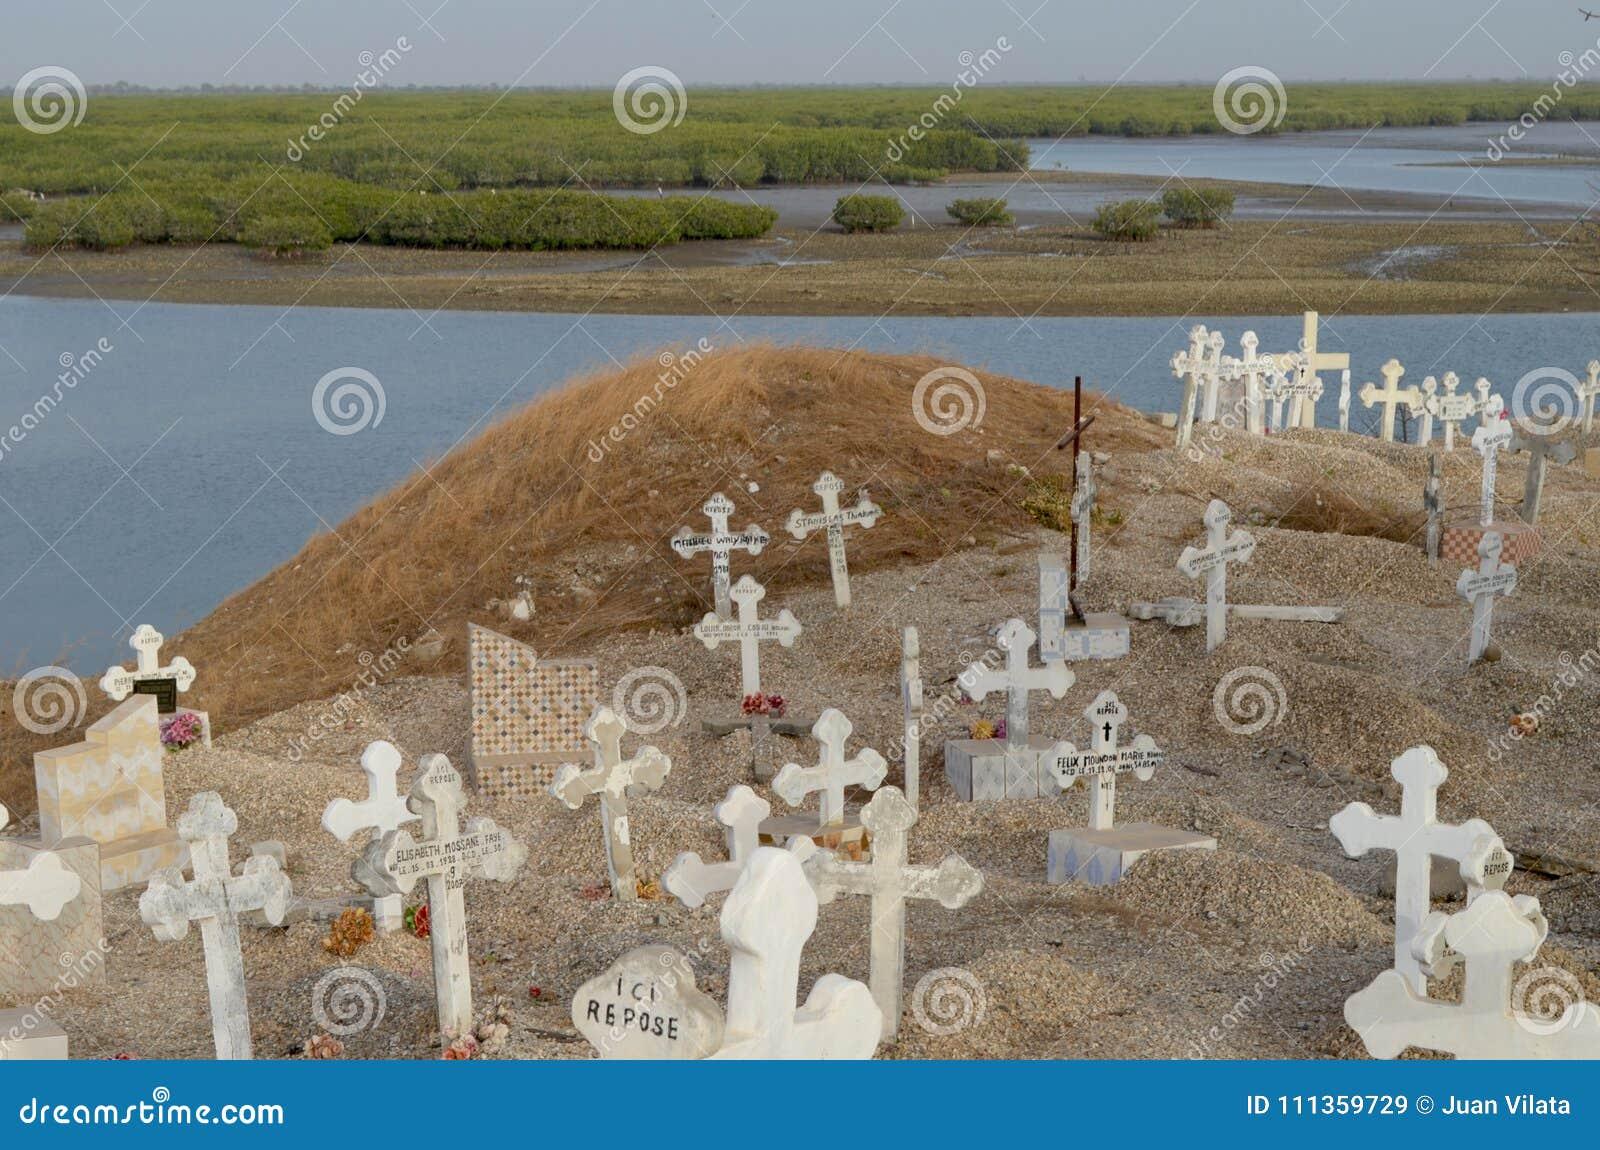 Muslim And Christian Graveyard In Joal-Fadiouth, Petite Côte